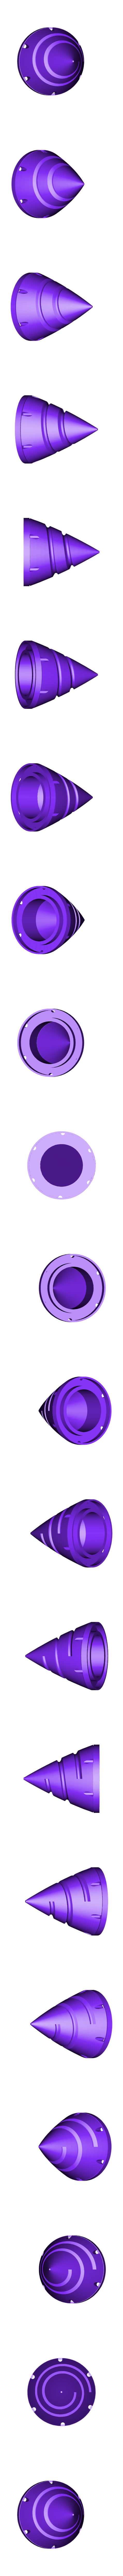 Spinner01ws-Test01.stl Download free STL file Jet Engine, 3-Spool • 3D printable object, konchan77